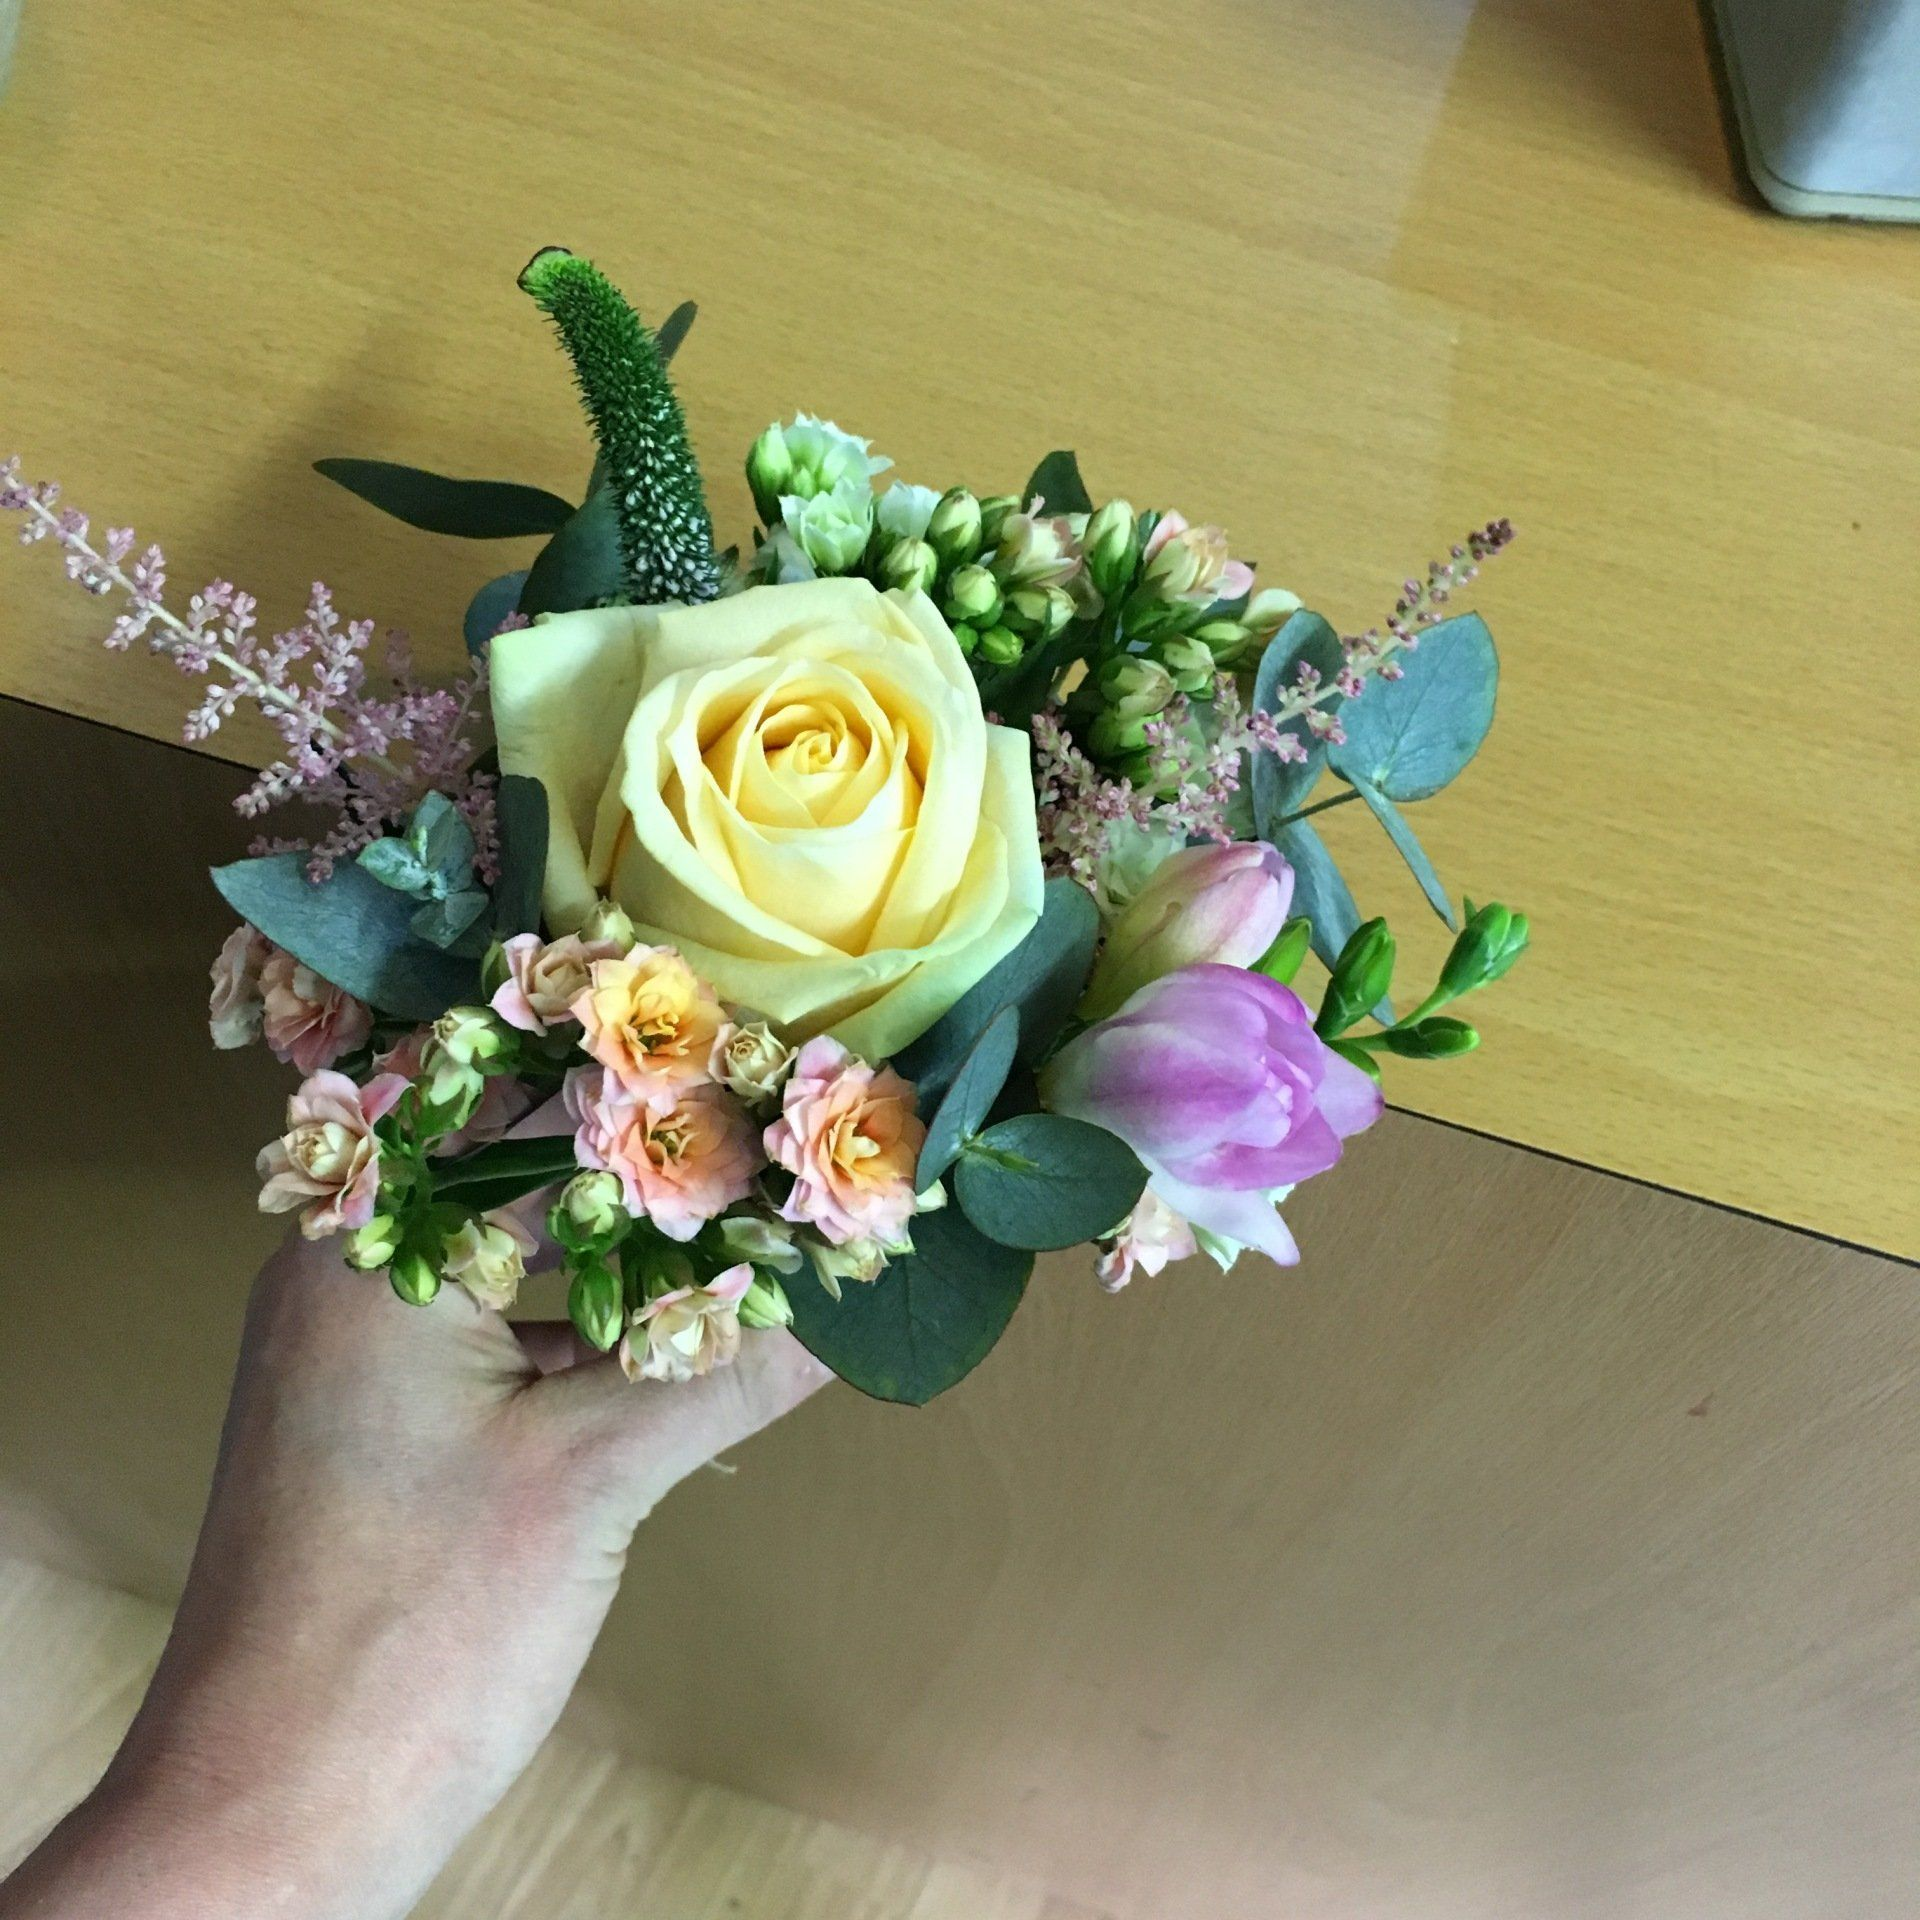 Wedding Flowers Lancashire: Gallery Of Bridesmaids Designs And Work, Wedding Flowers